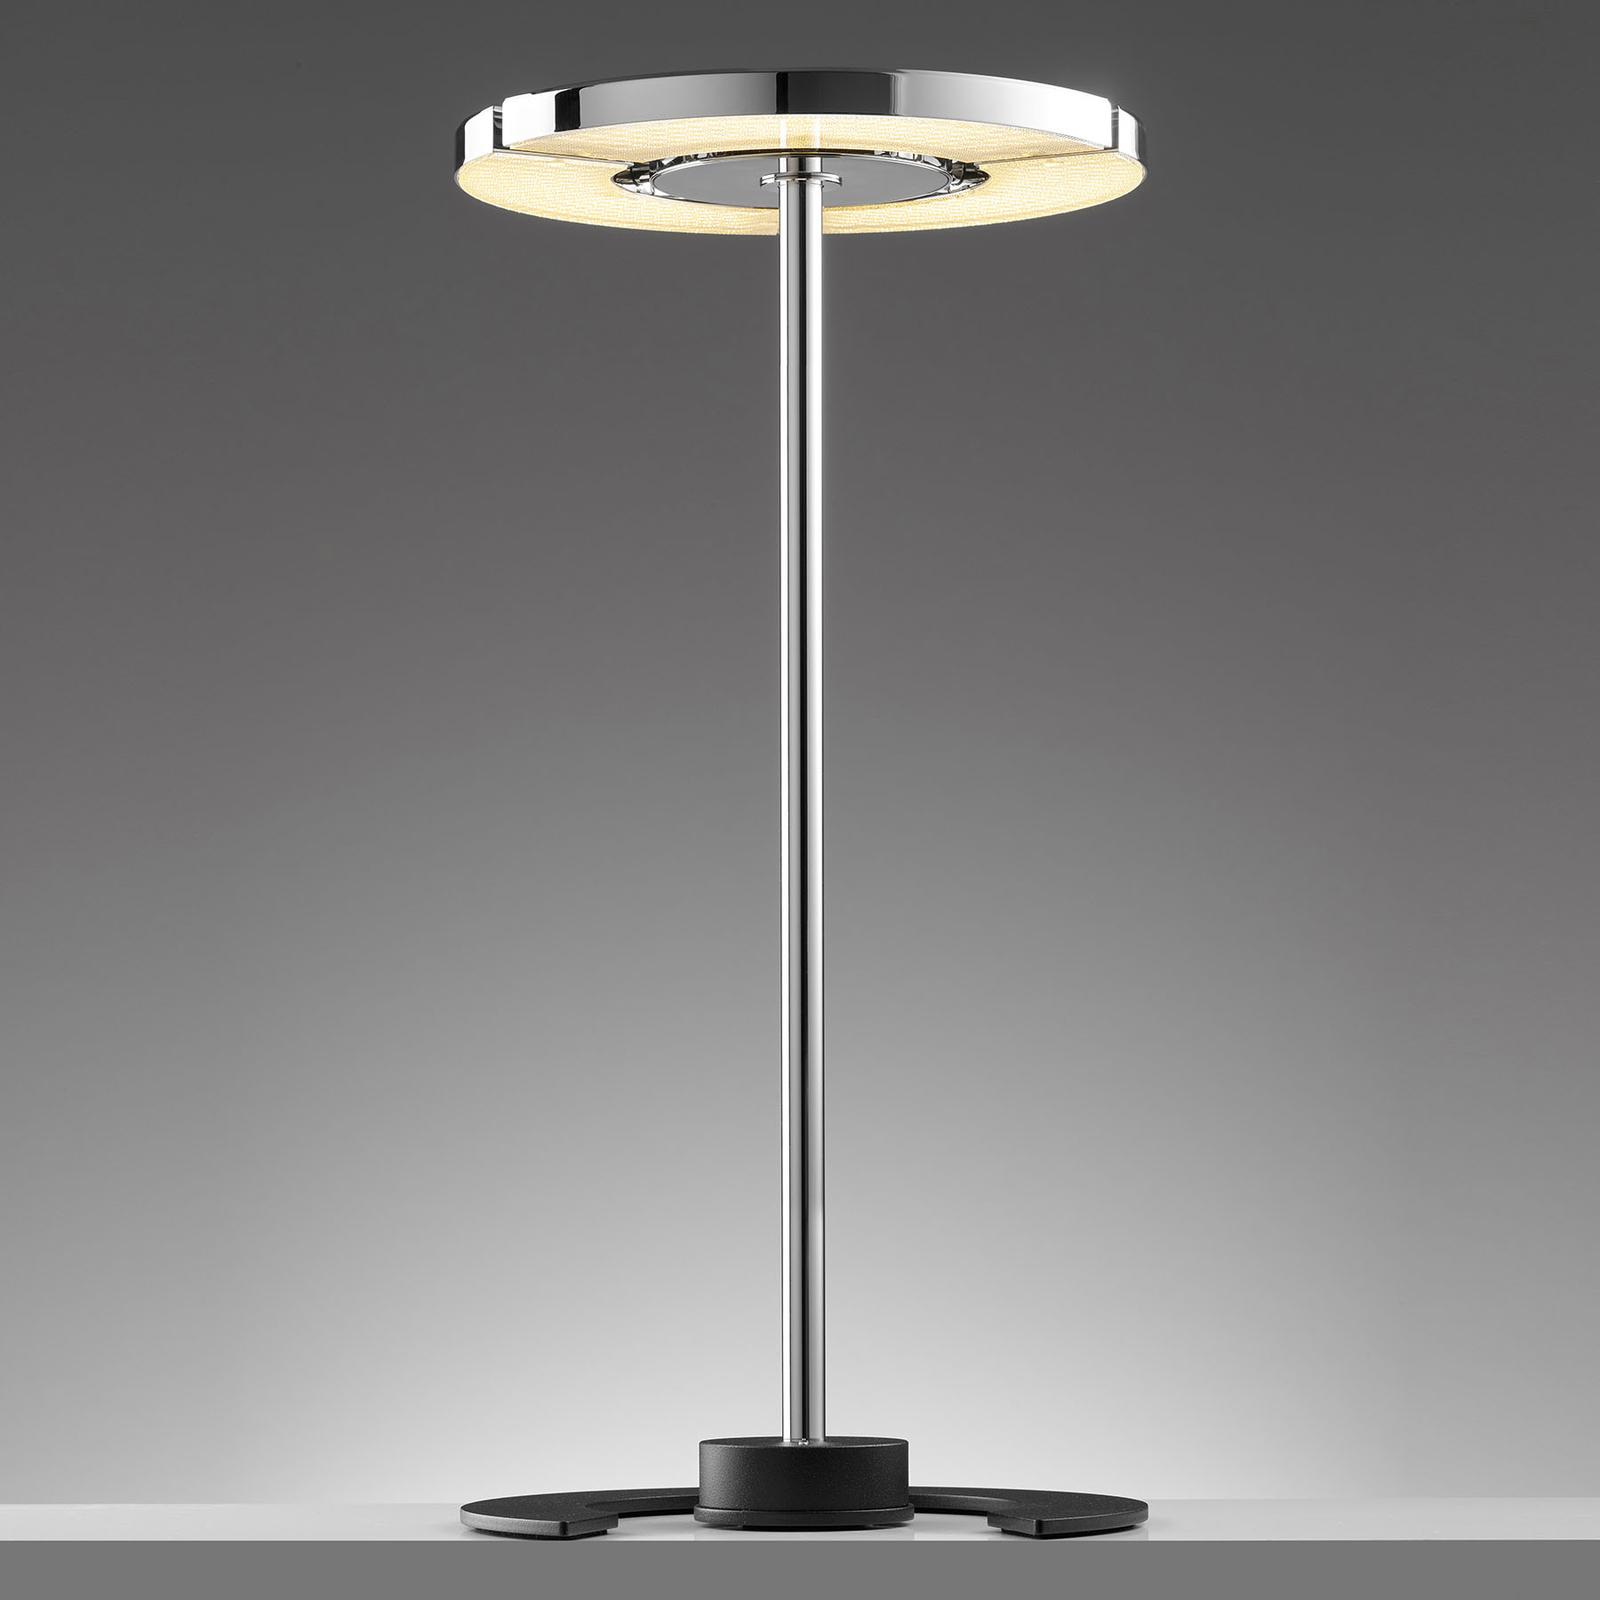 OLIGO Trinity lampa stołowa LED 3 ruchome segmenty